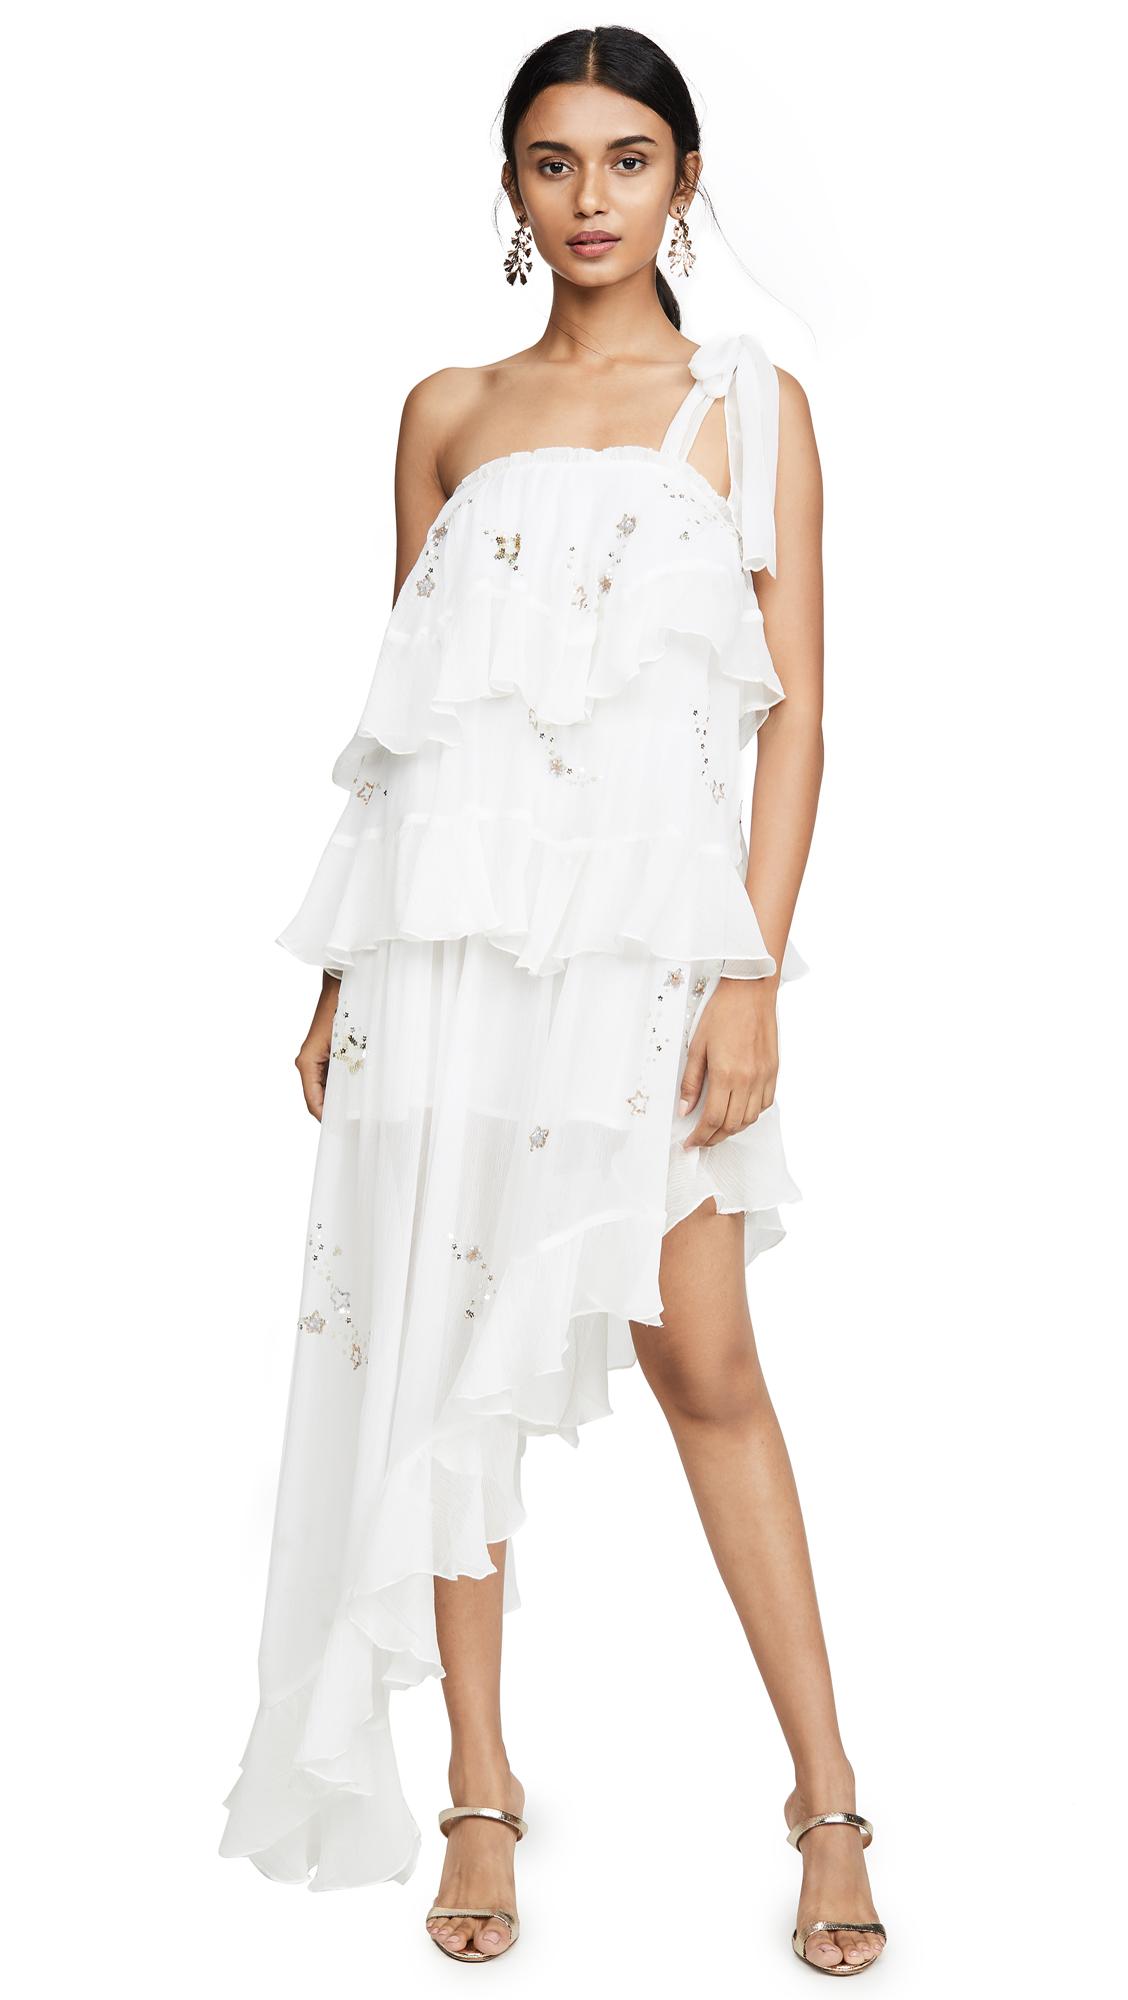 ROCOCO SAND Star Light One Shoulder Dress